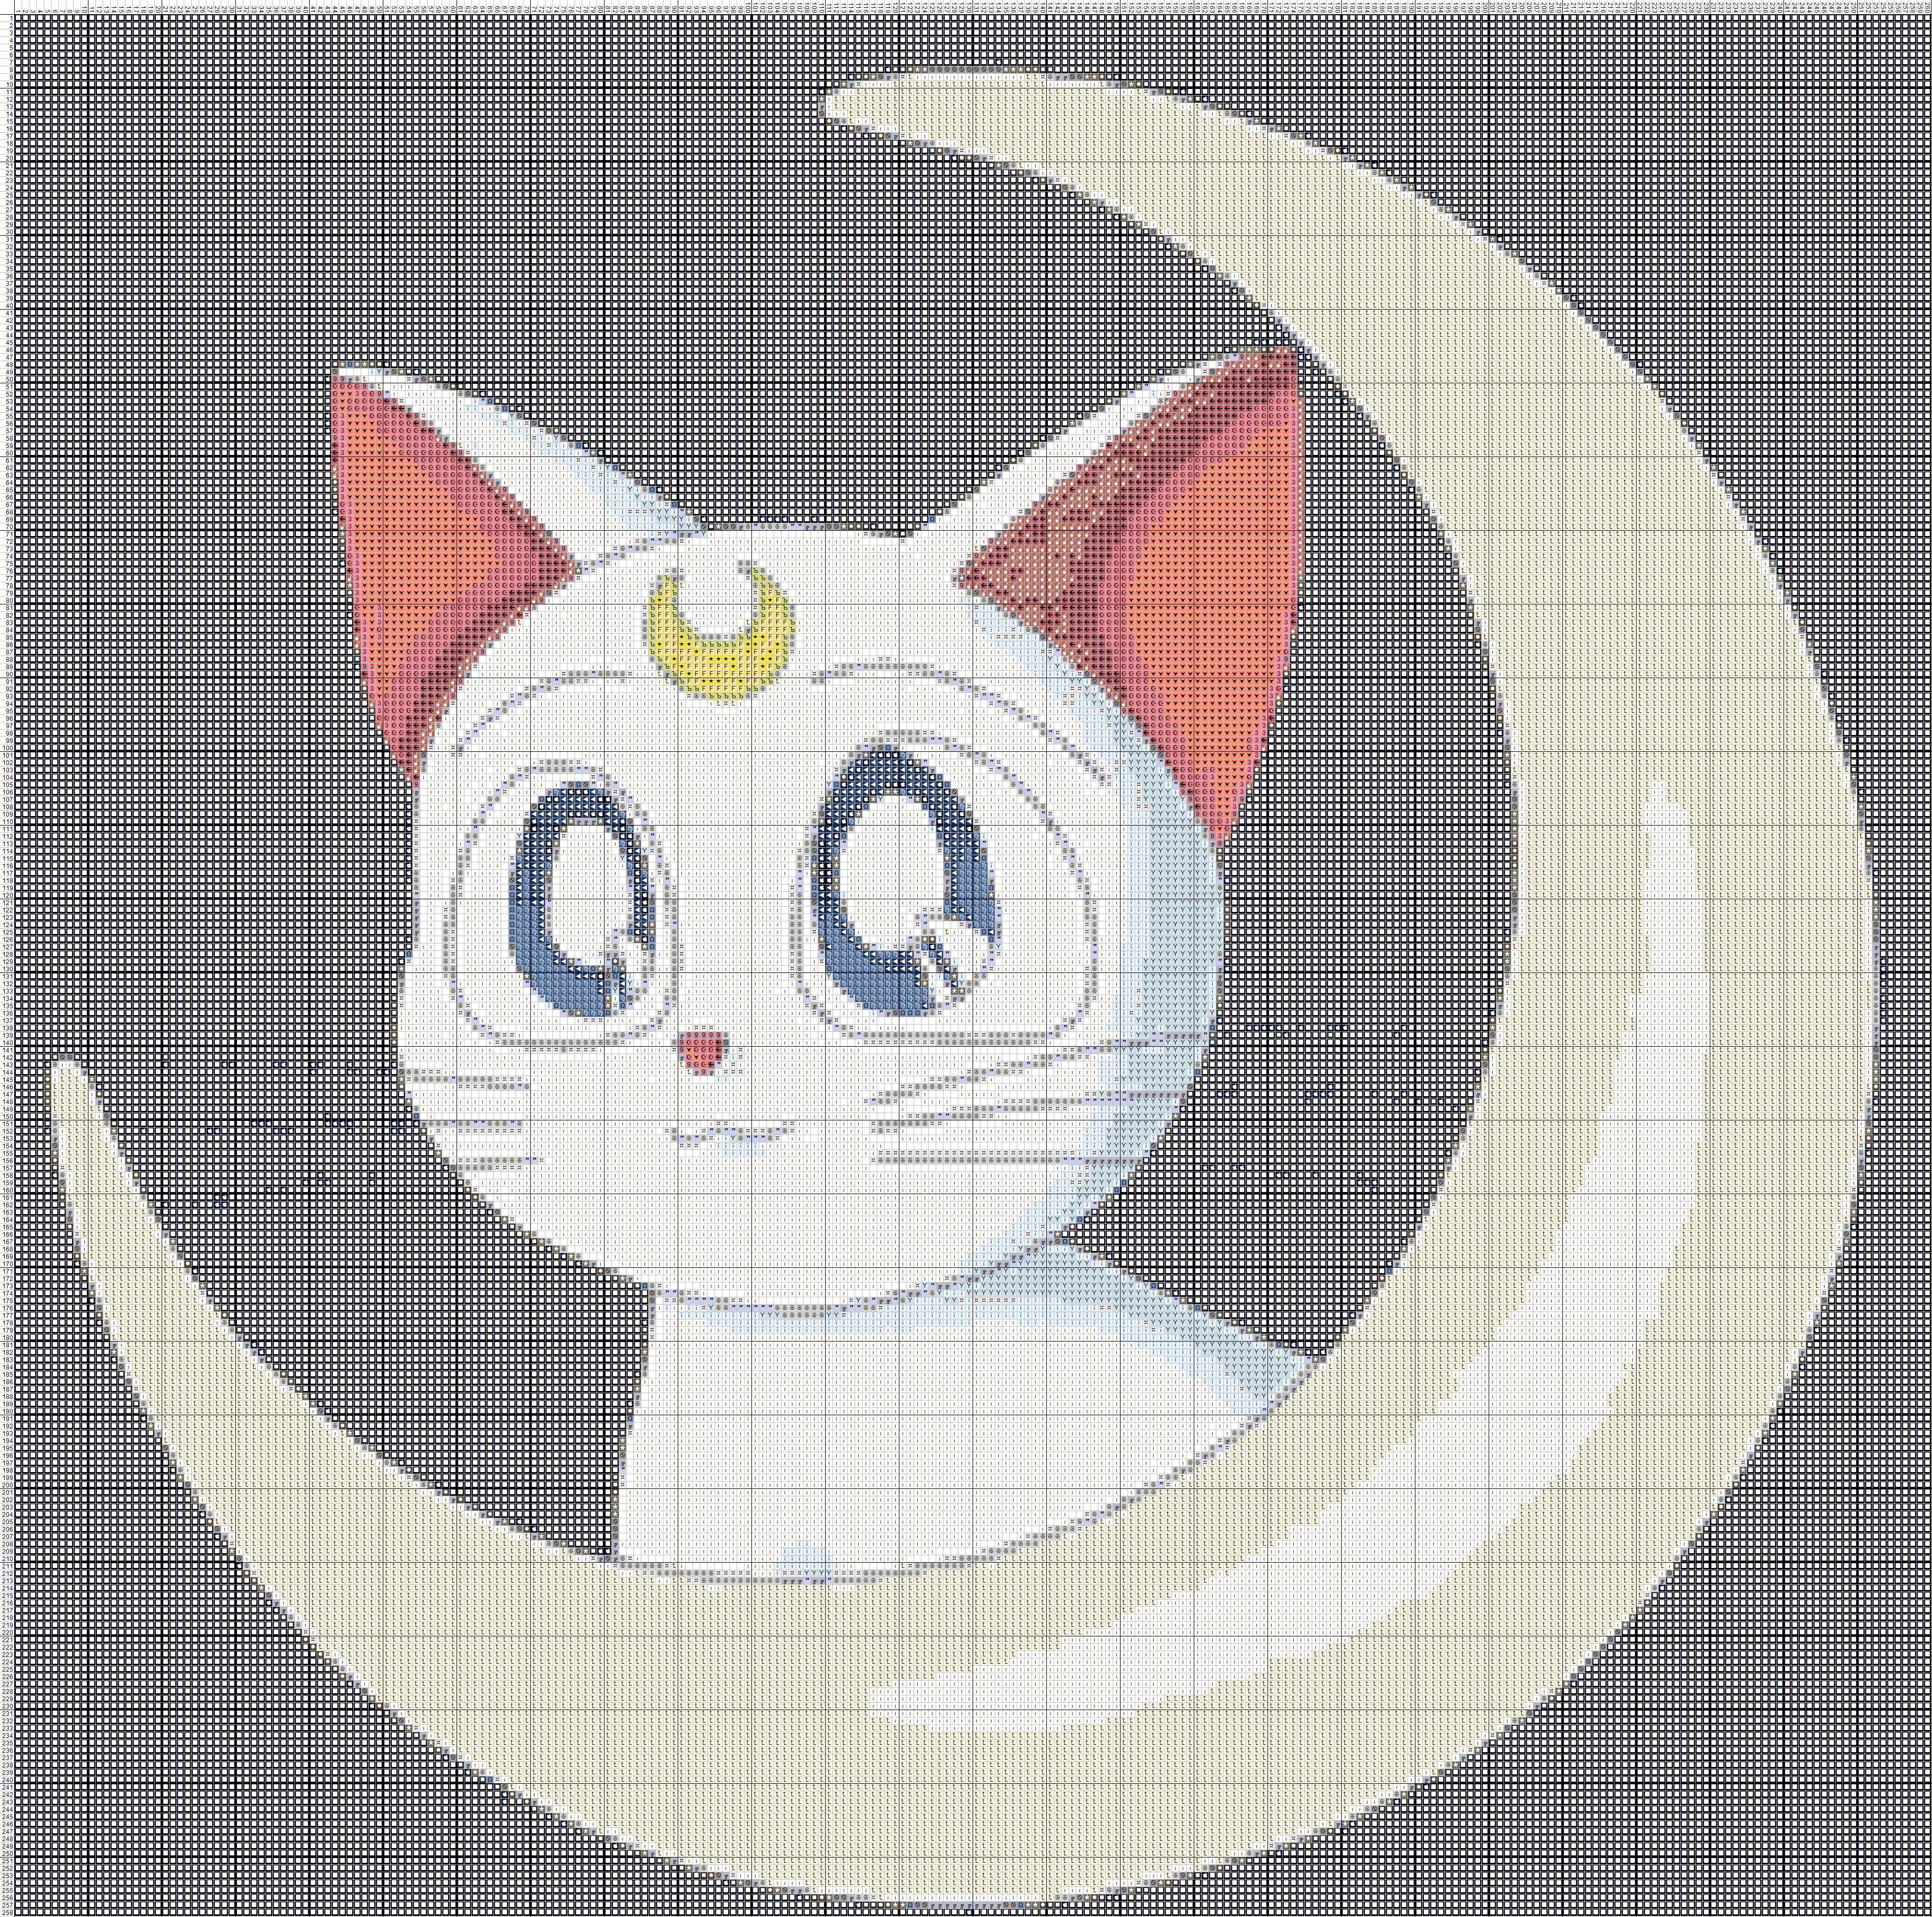 Pin by Rebecca Willaert on crafts sailor moon   Pinterest   Sailor ...